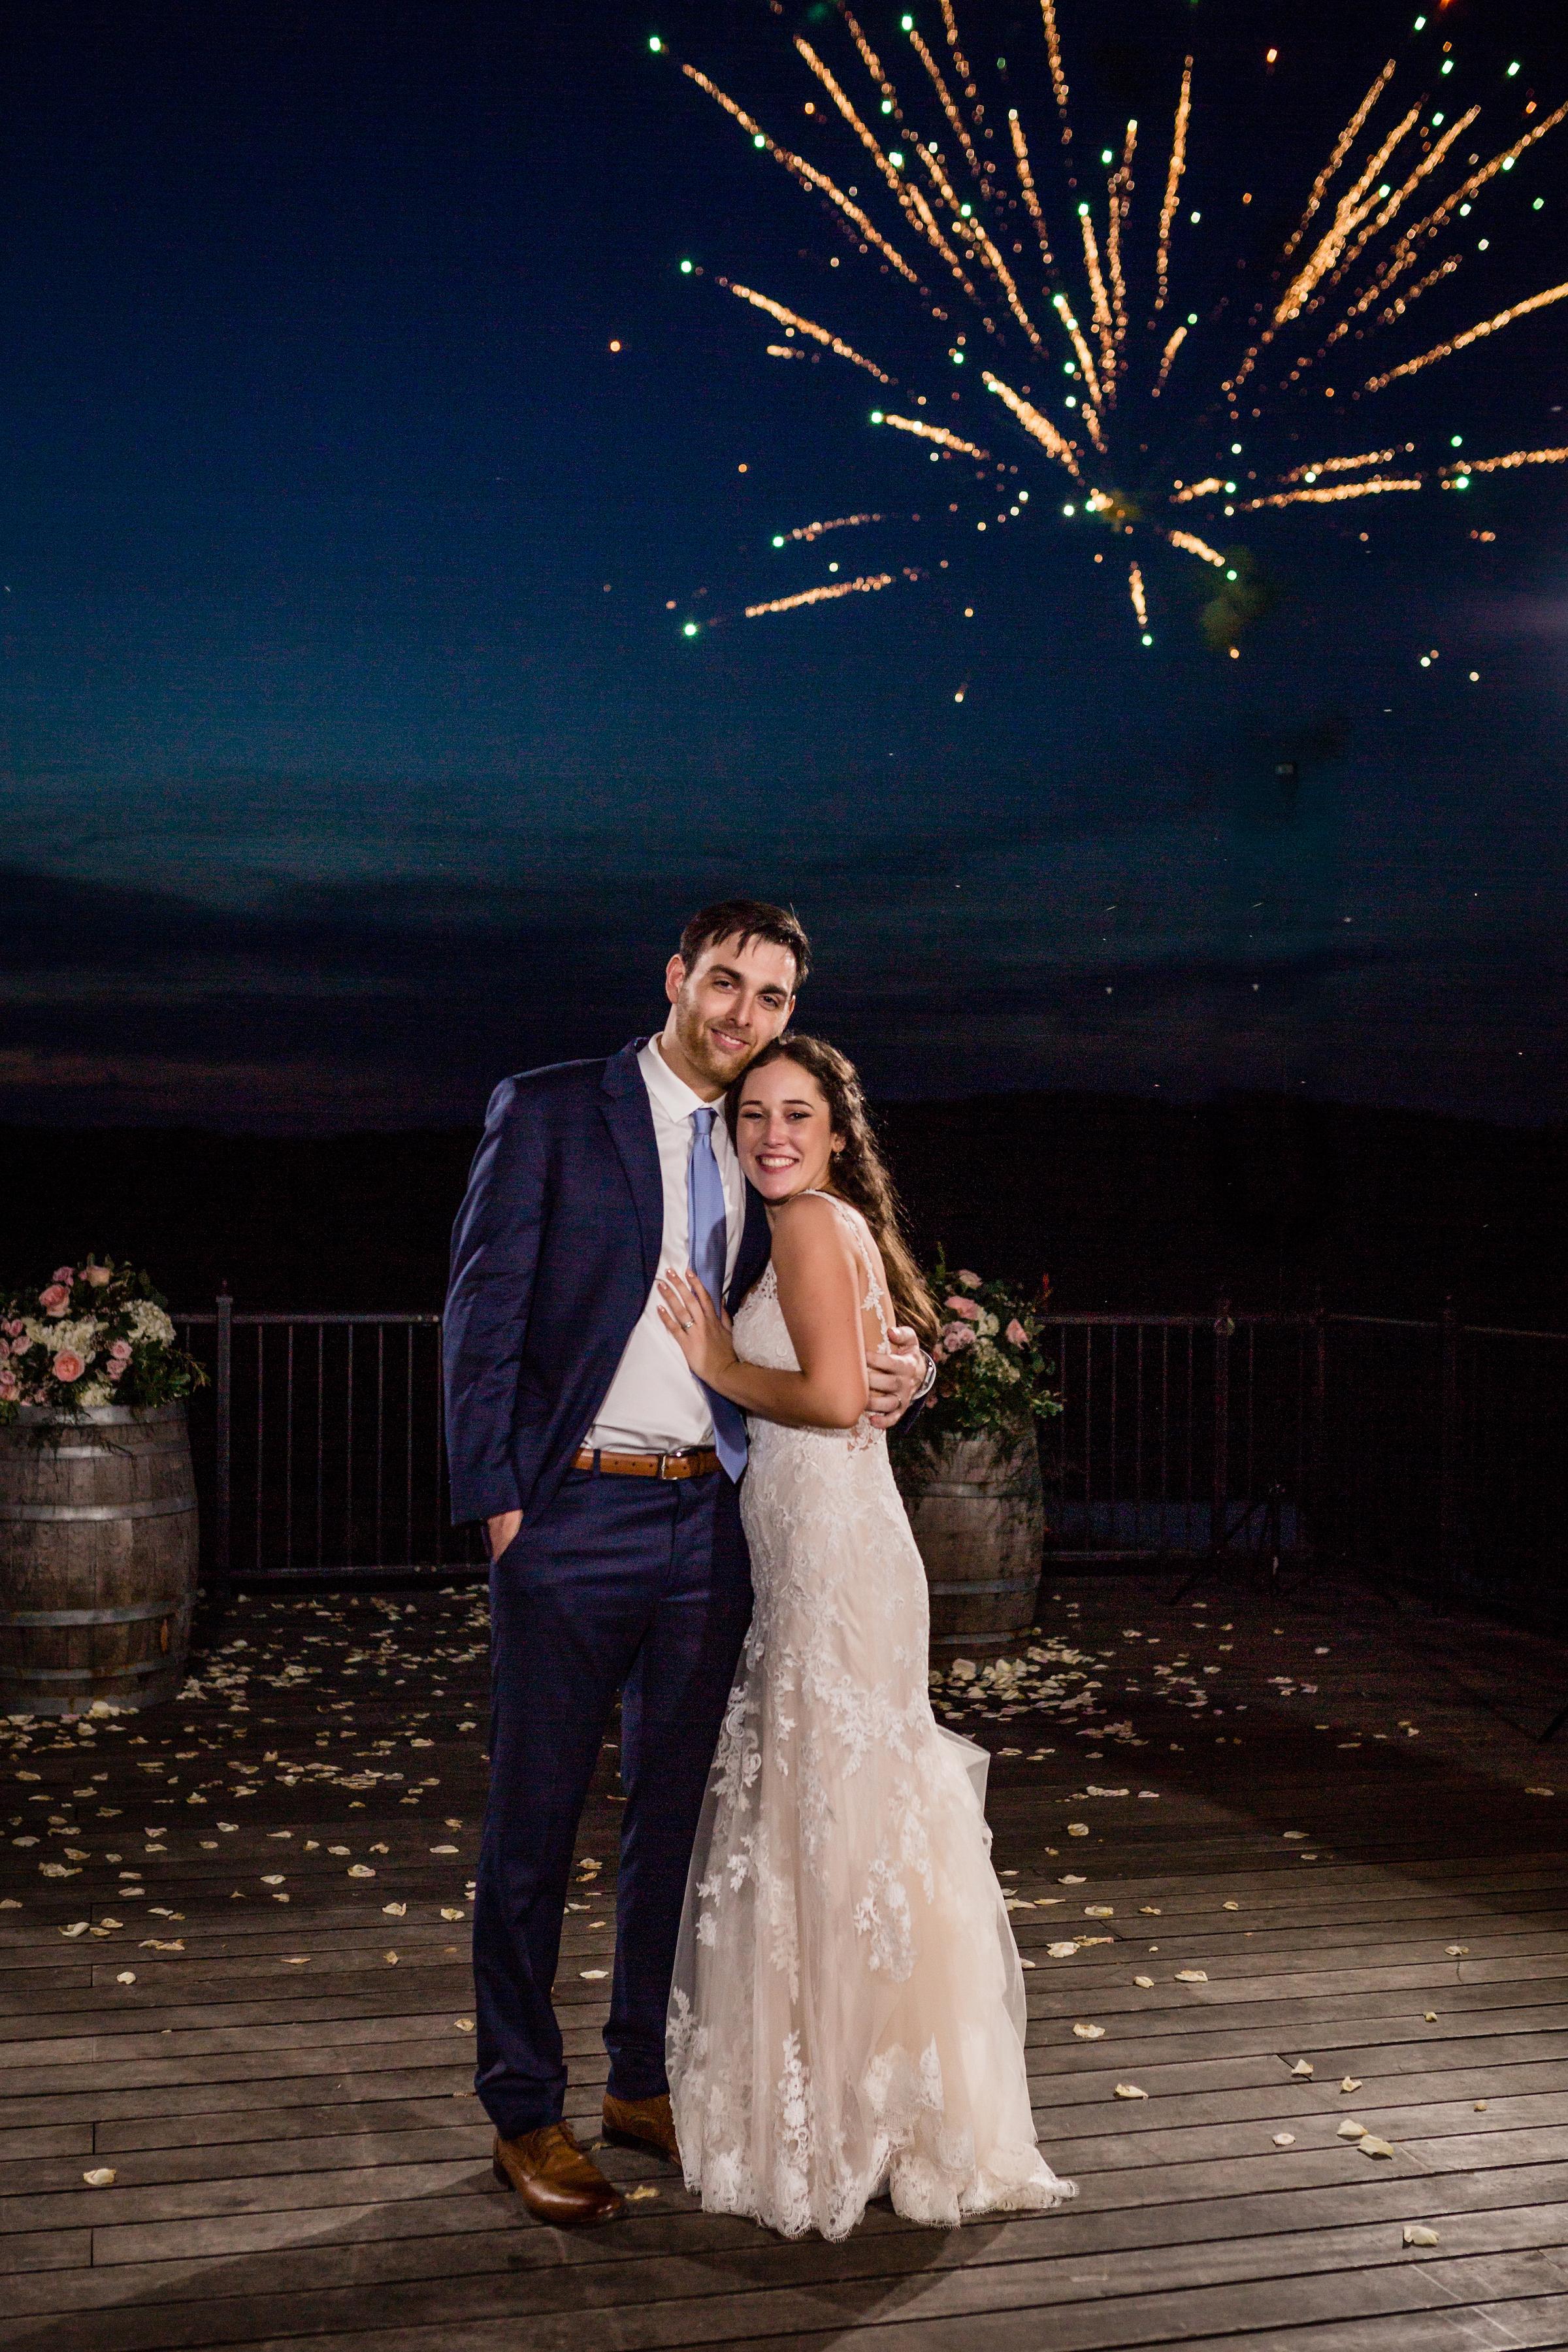 brielle-davis-events-kairos-photography-chandler-hill-wedding-fireworks-633.jpg